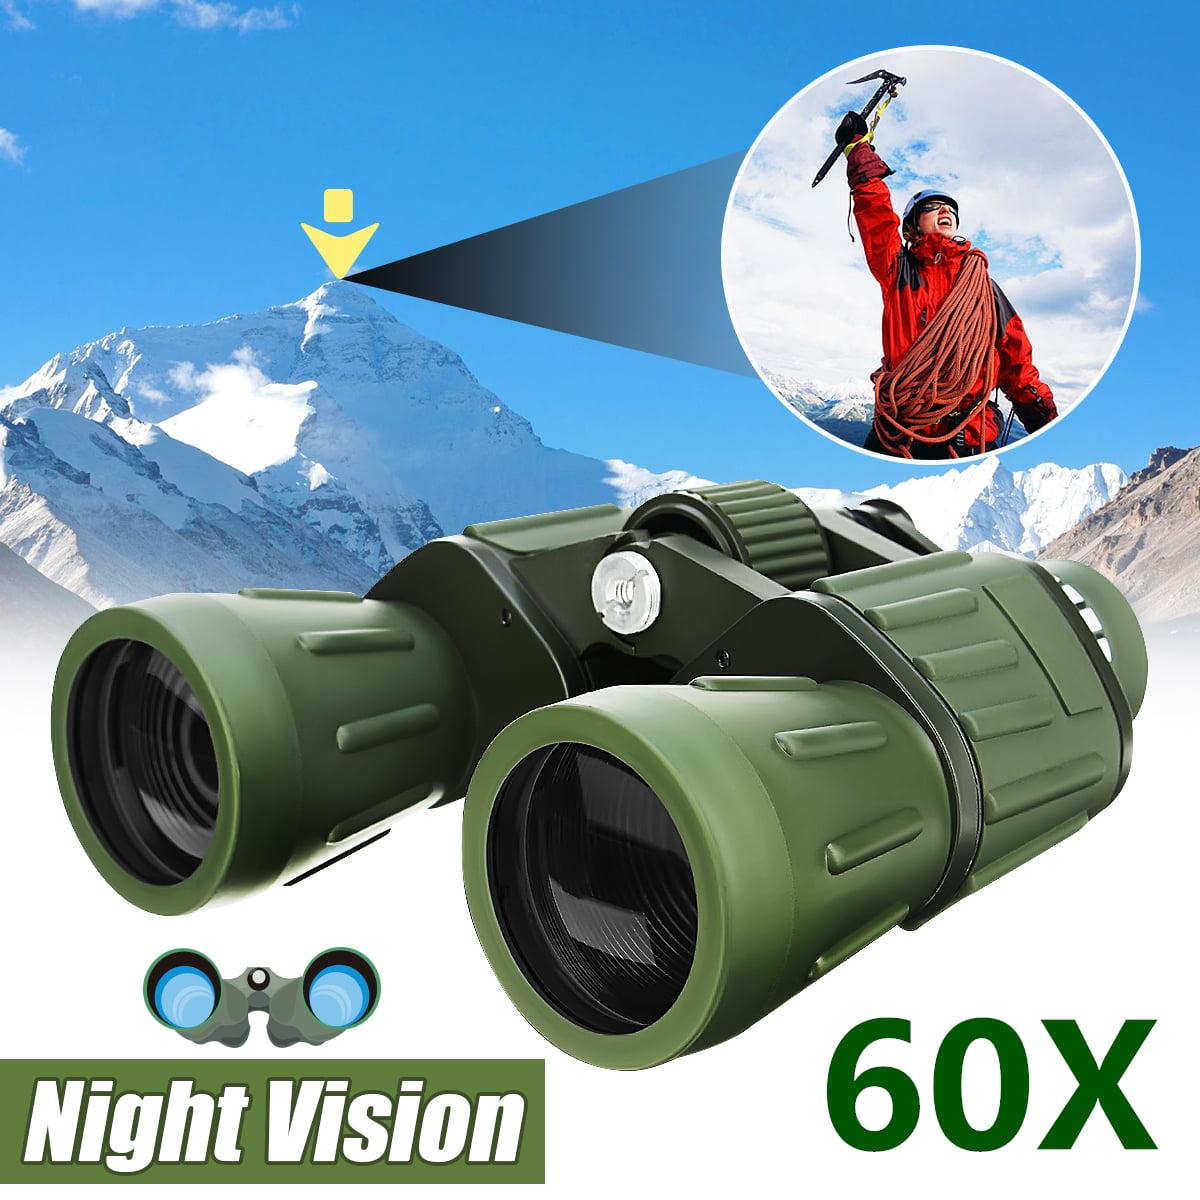 60x50 Zoom Military Army High Power HD Binoculars Night Vision Anti UV Adjustable Handheld Binocular Telescope Hunting... by